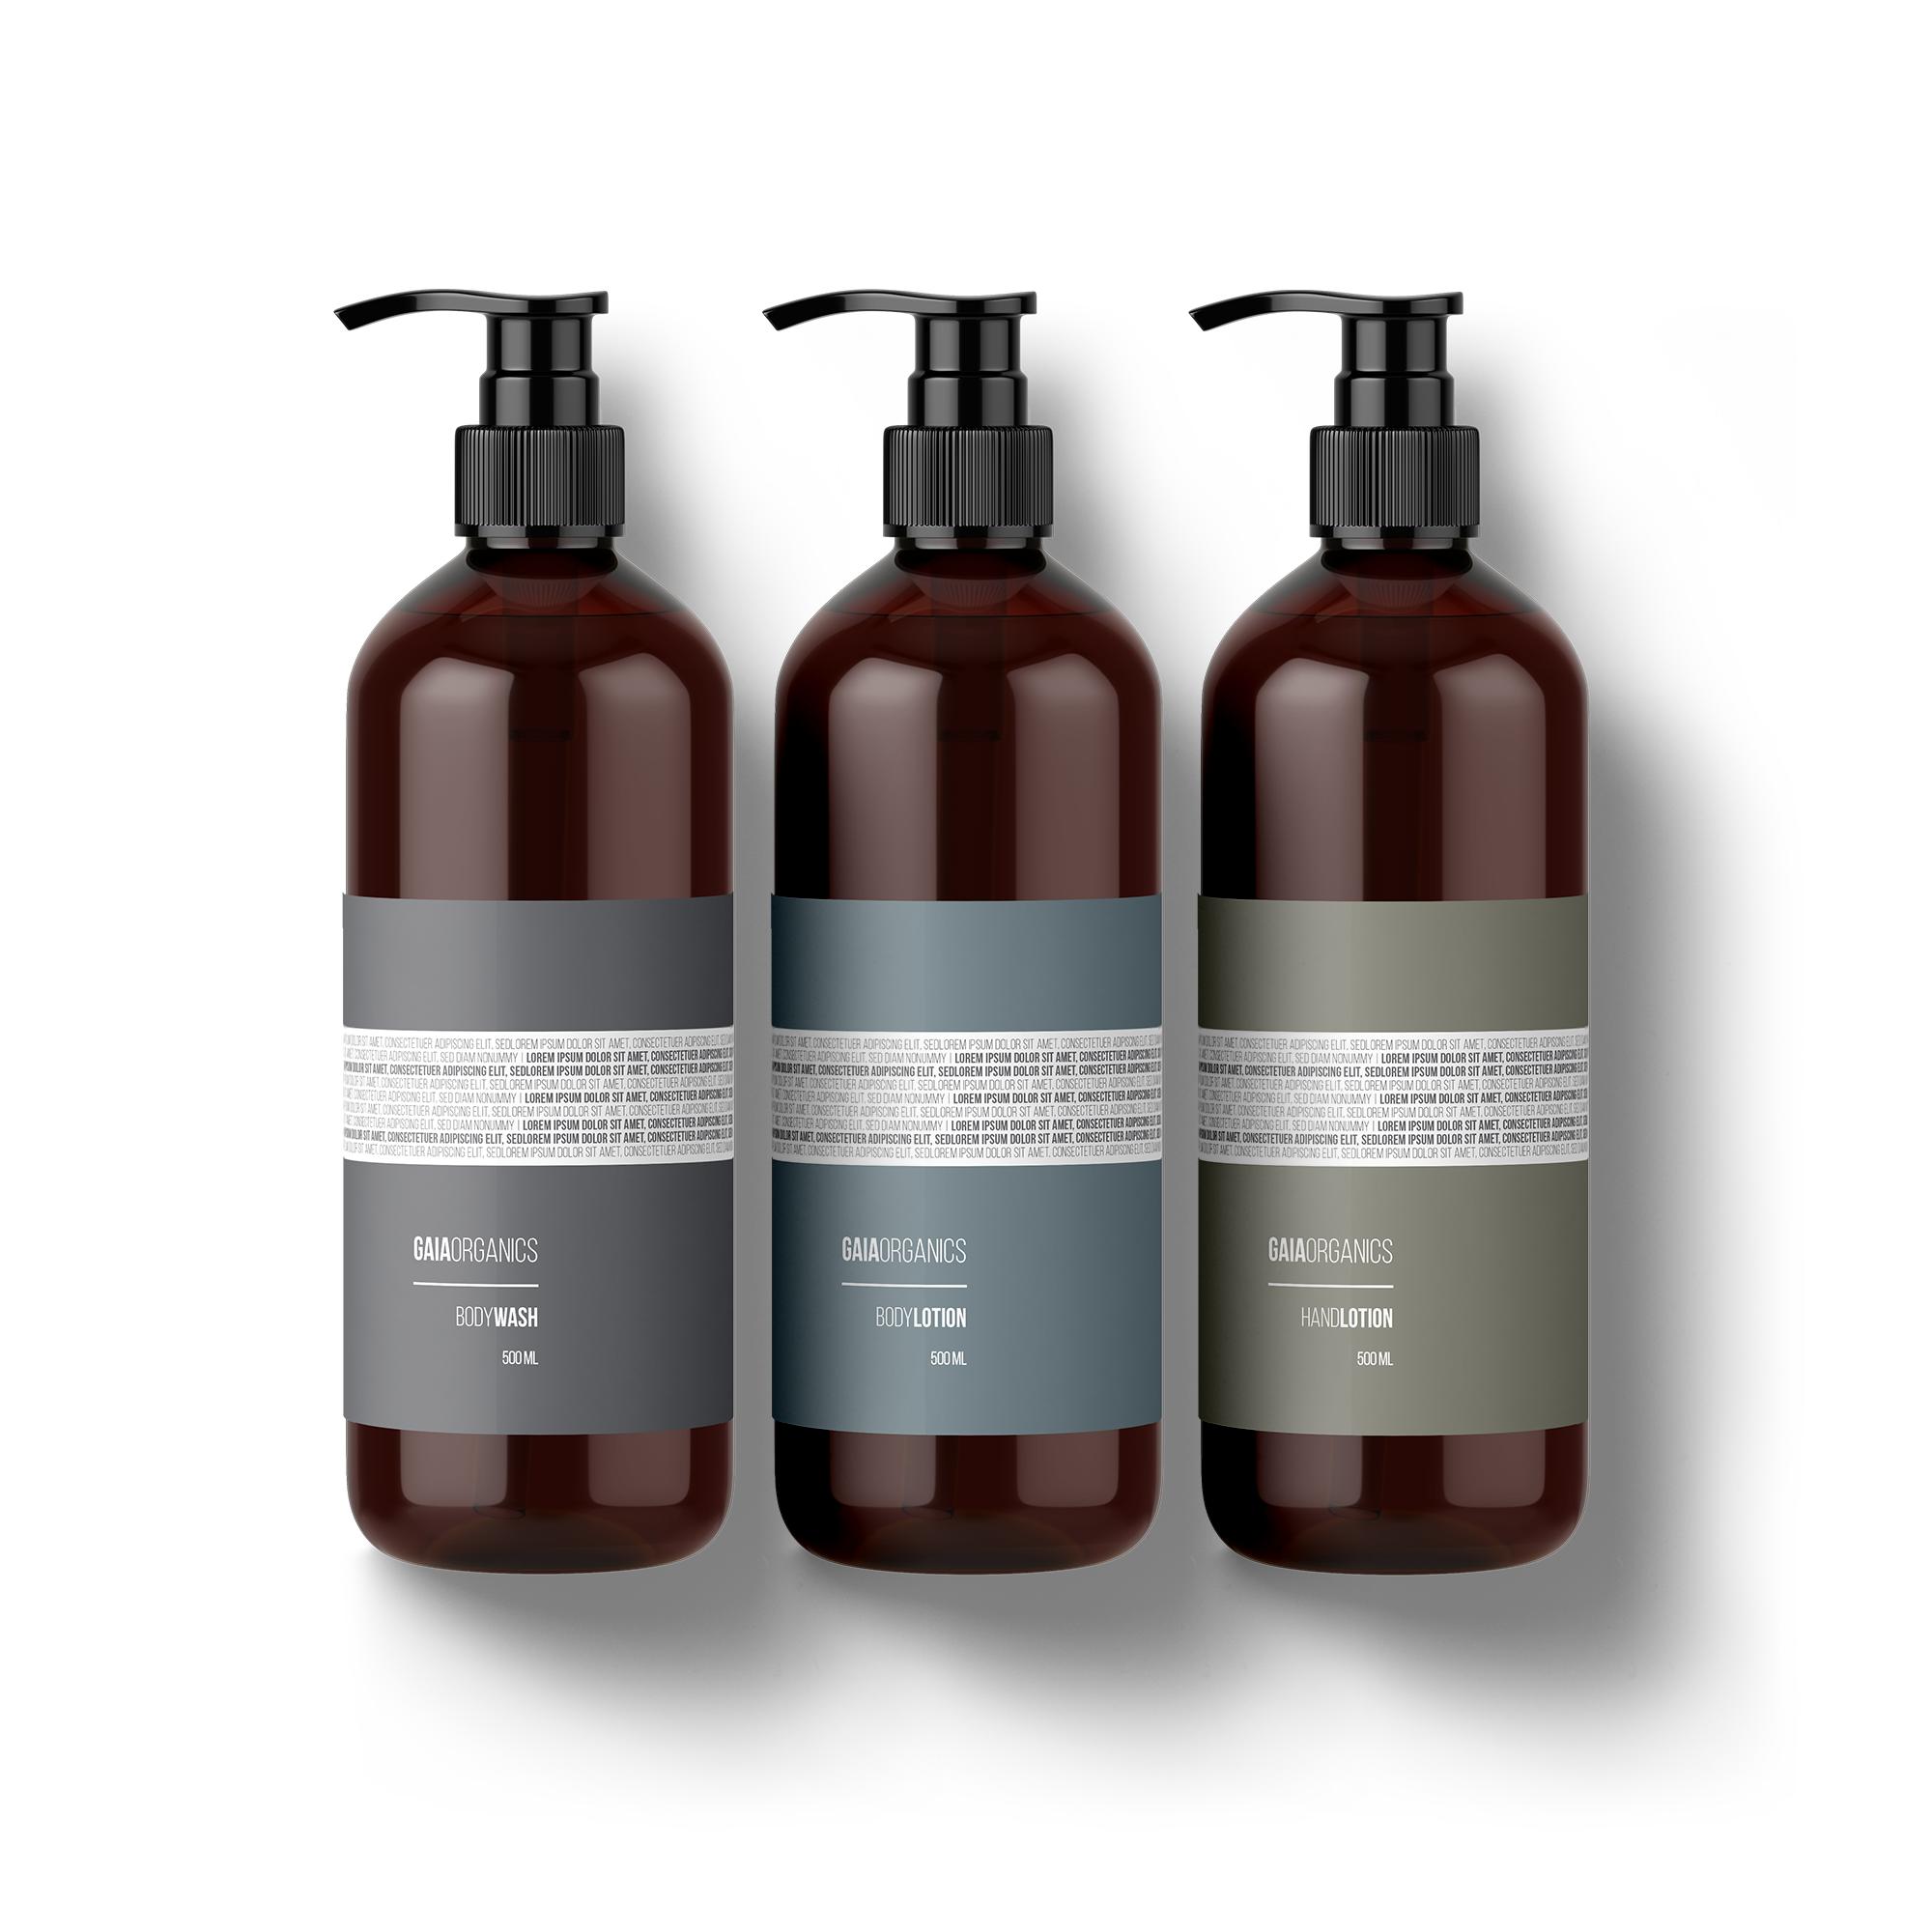 minimalist label design